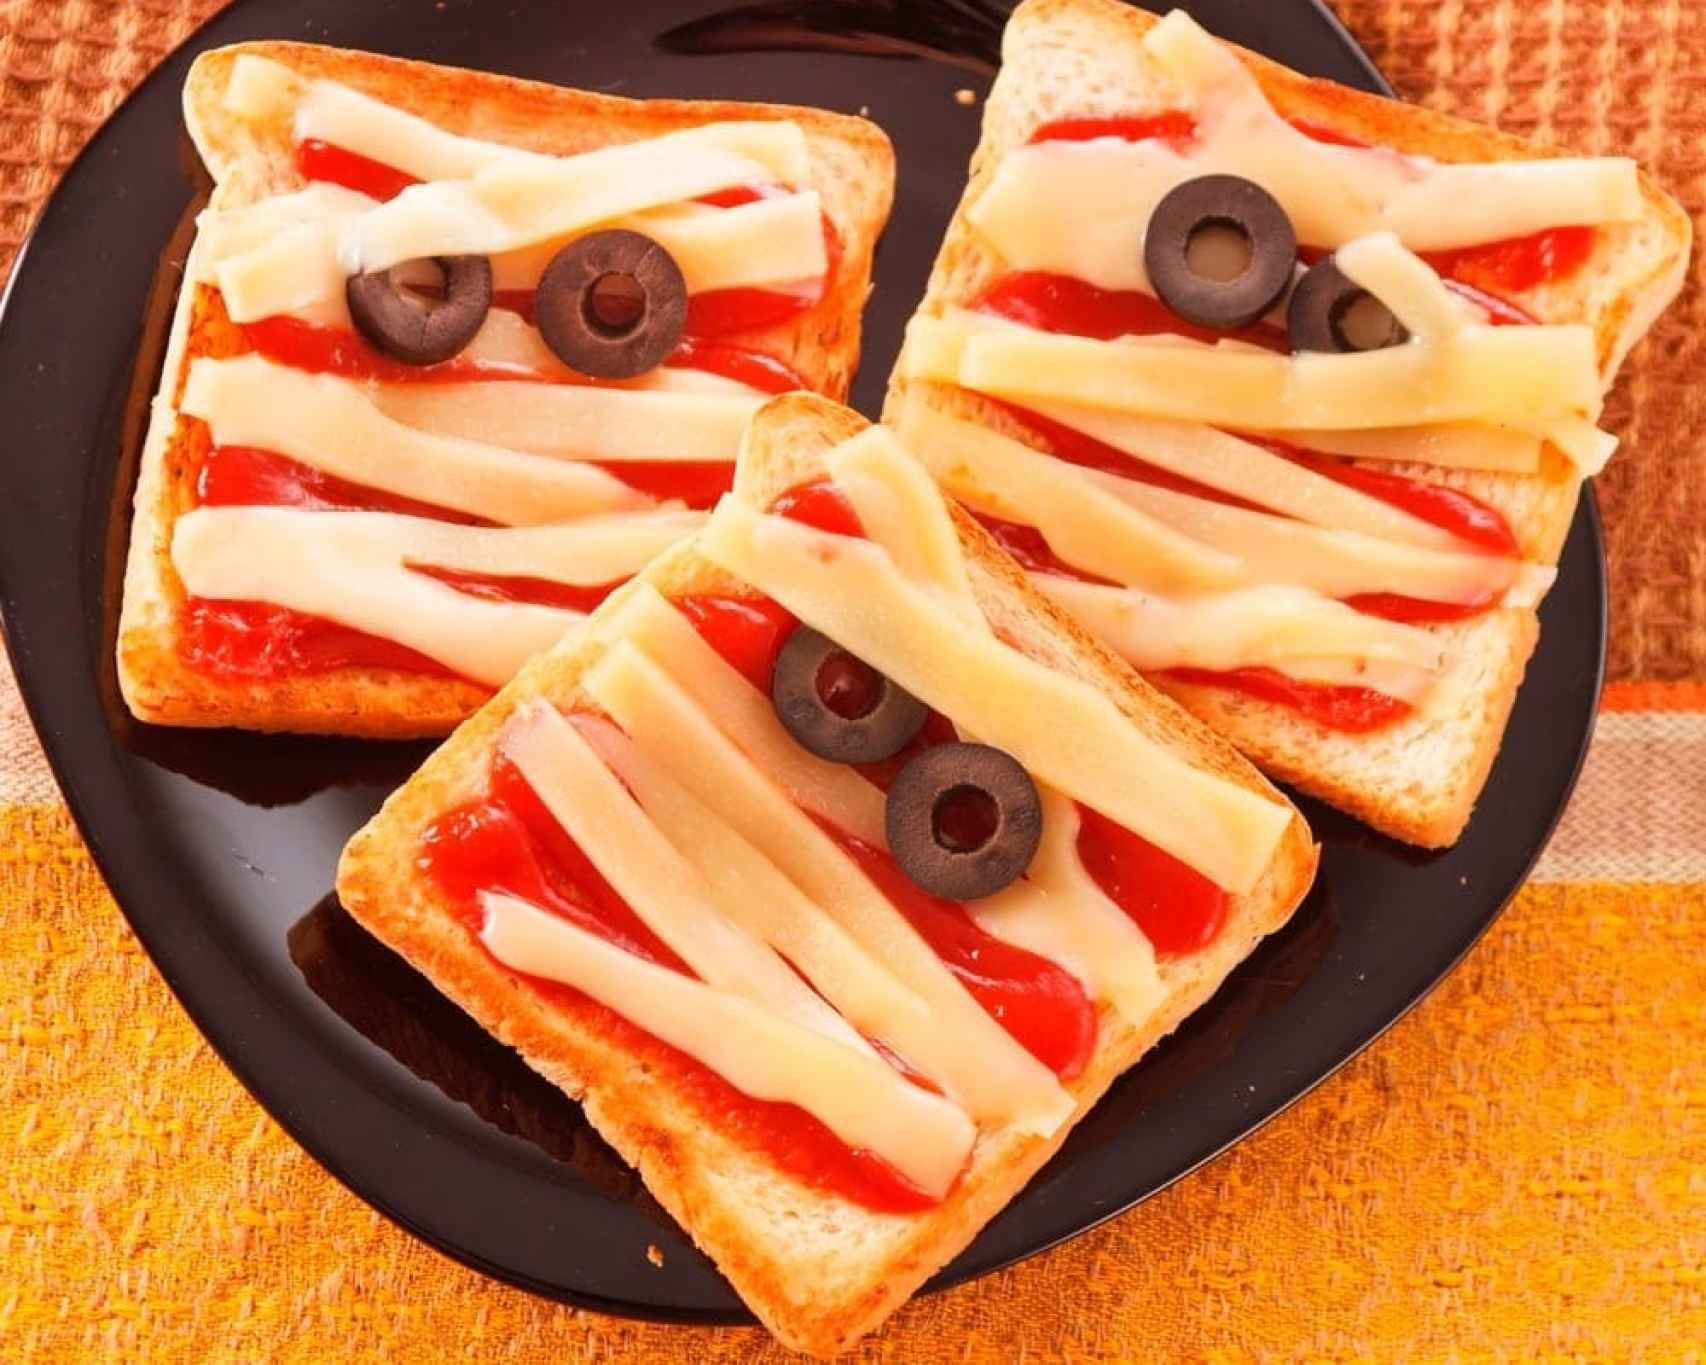 Sándwiches con forma de momia